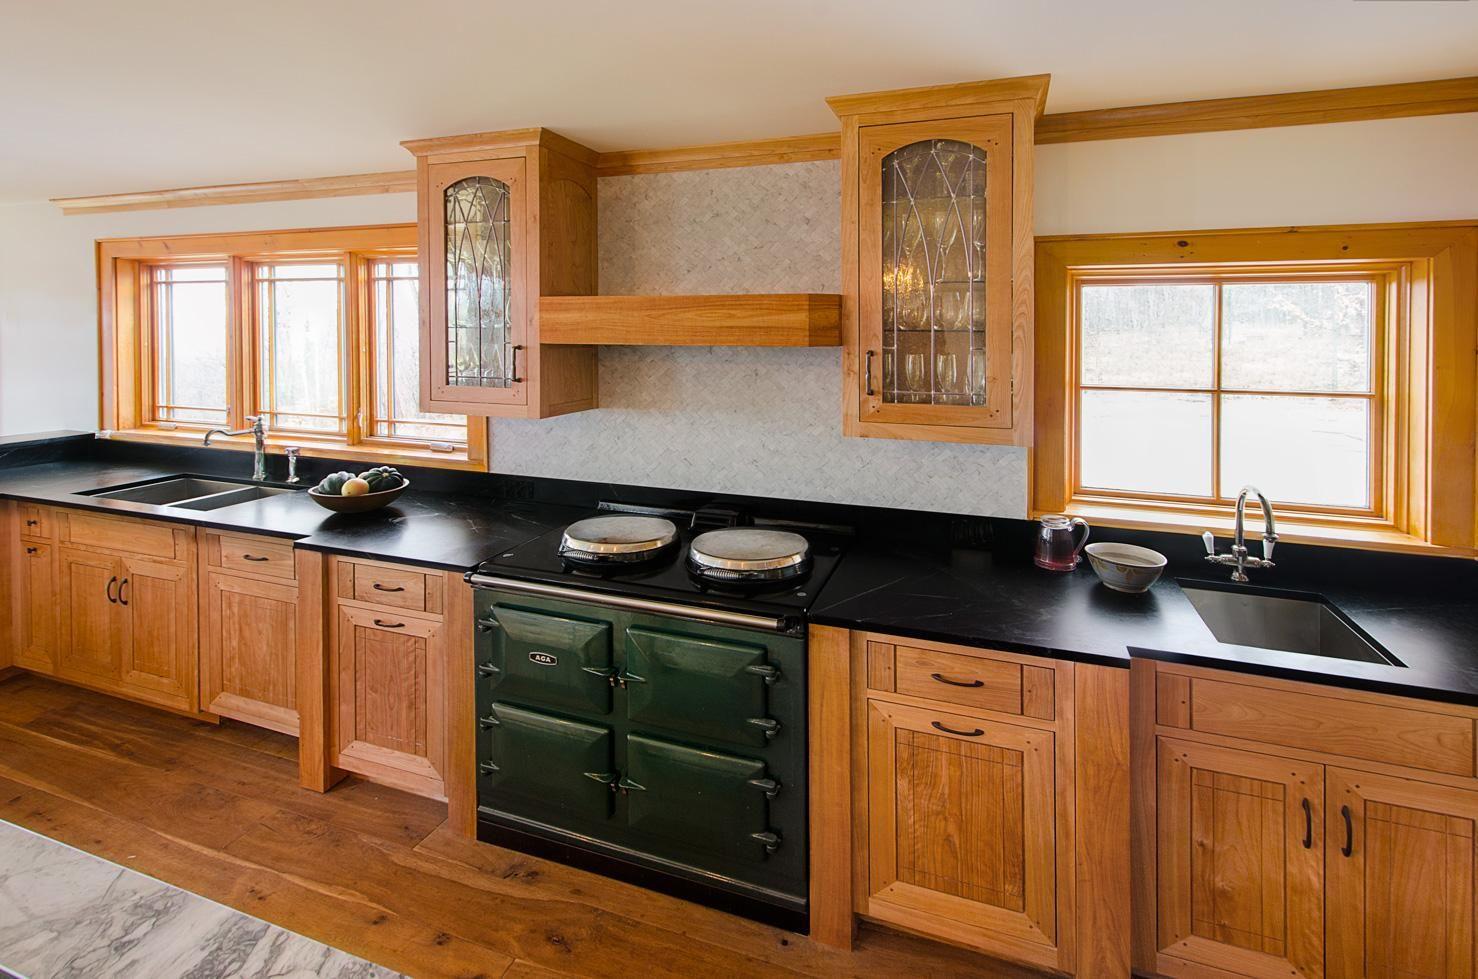 Kitchen Cabinets Amazing Cabinet Hardware Modern